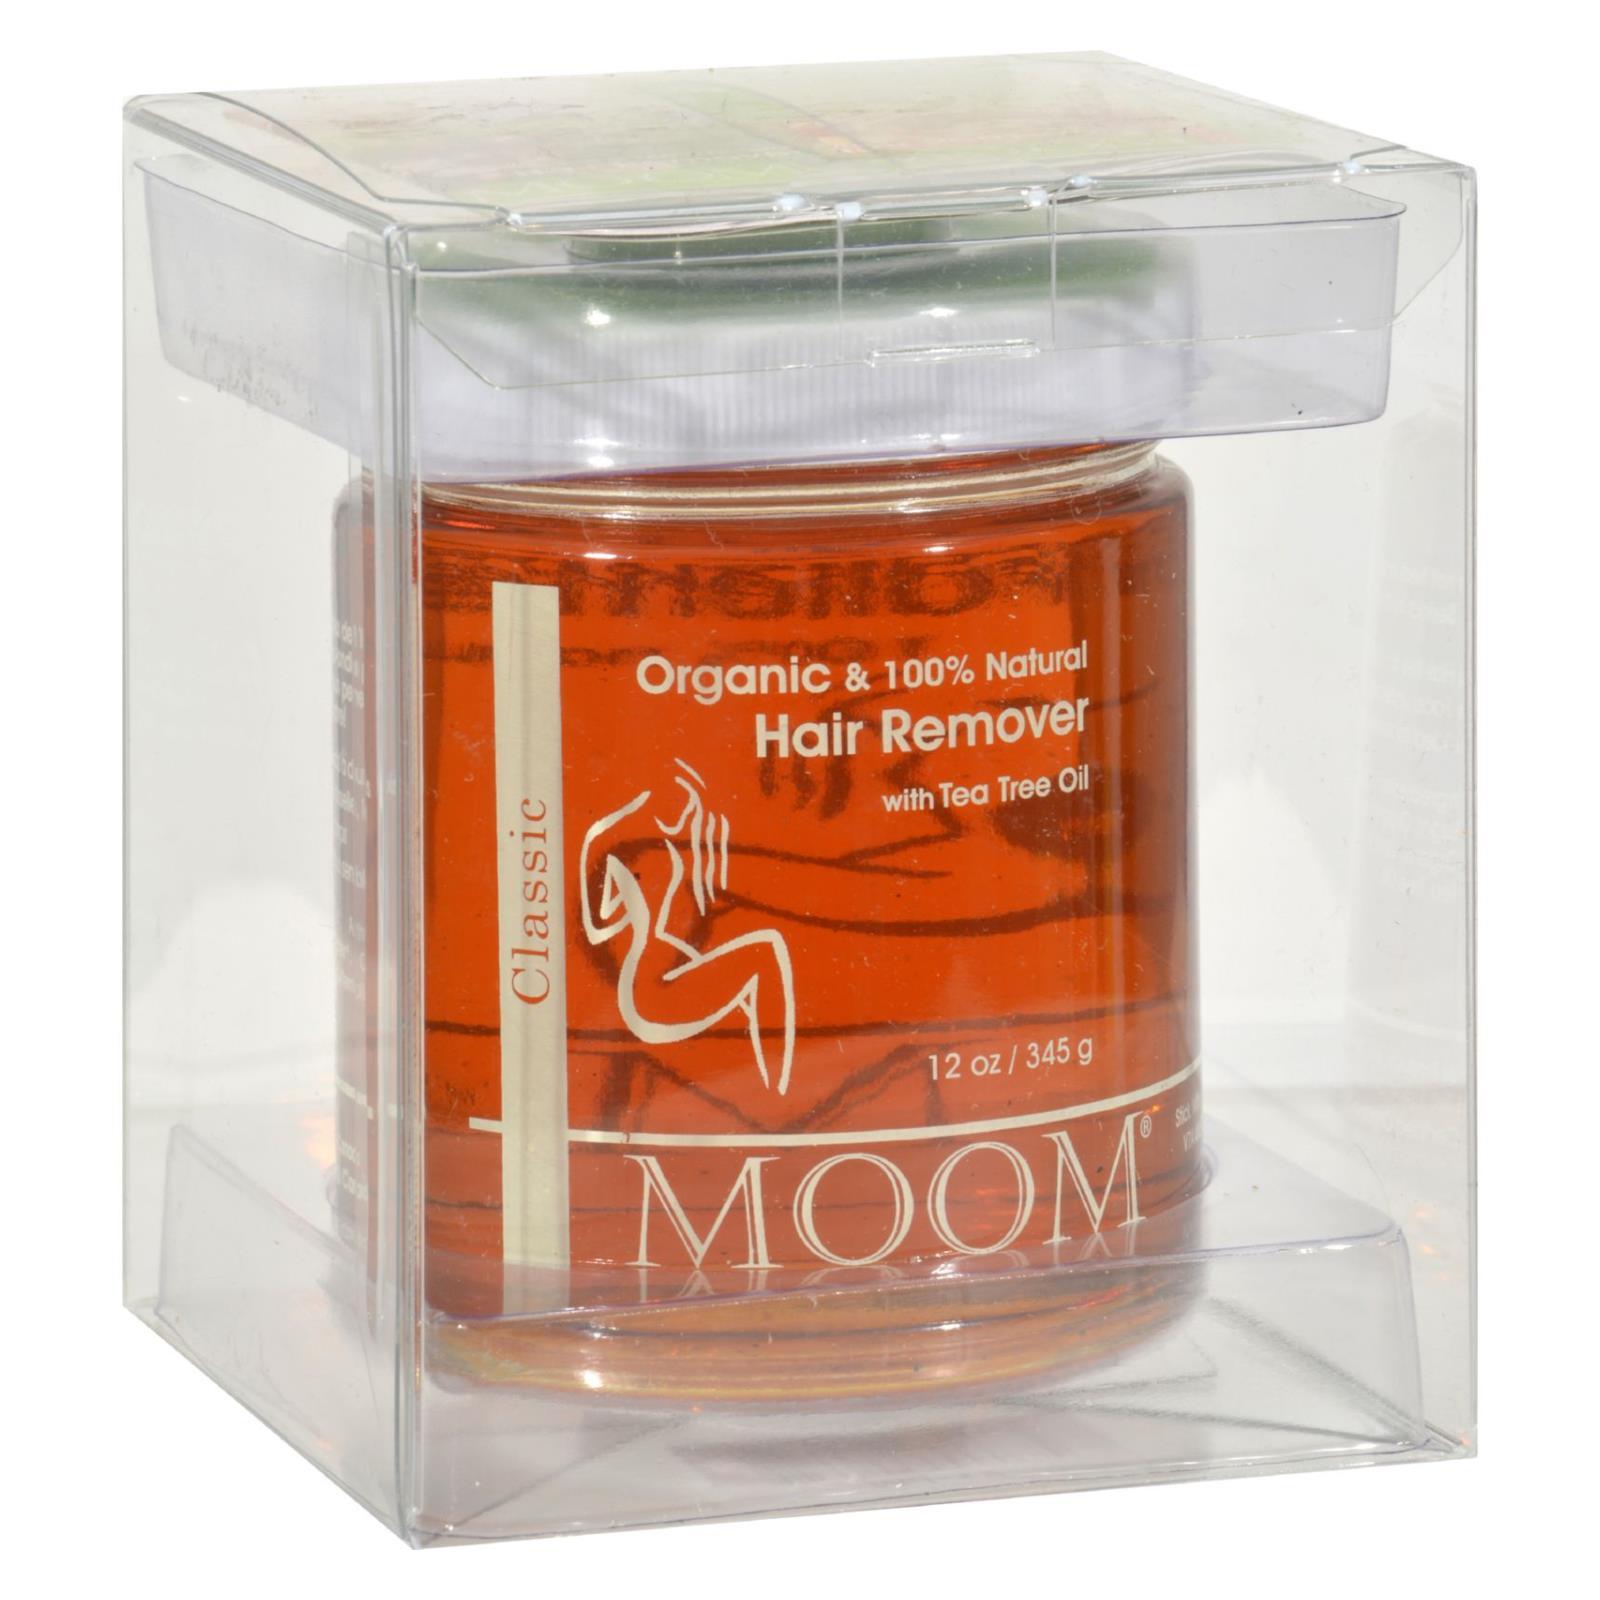 Moom Organic Hair Removal With Tea Tree Refill Jar - 12 oz